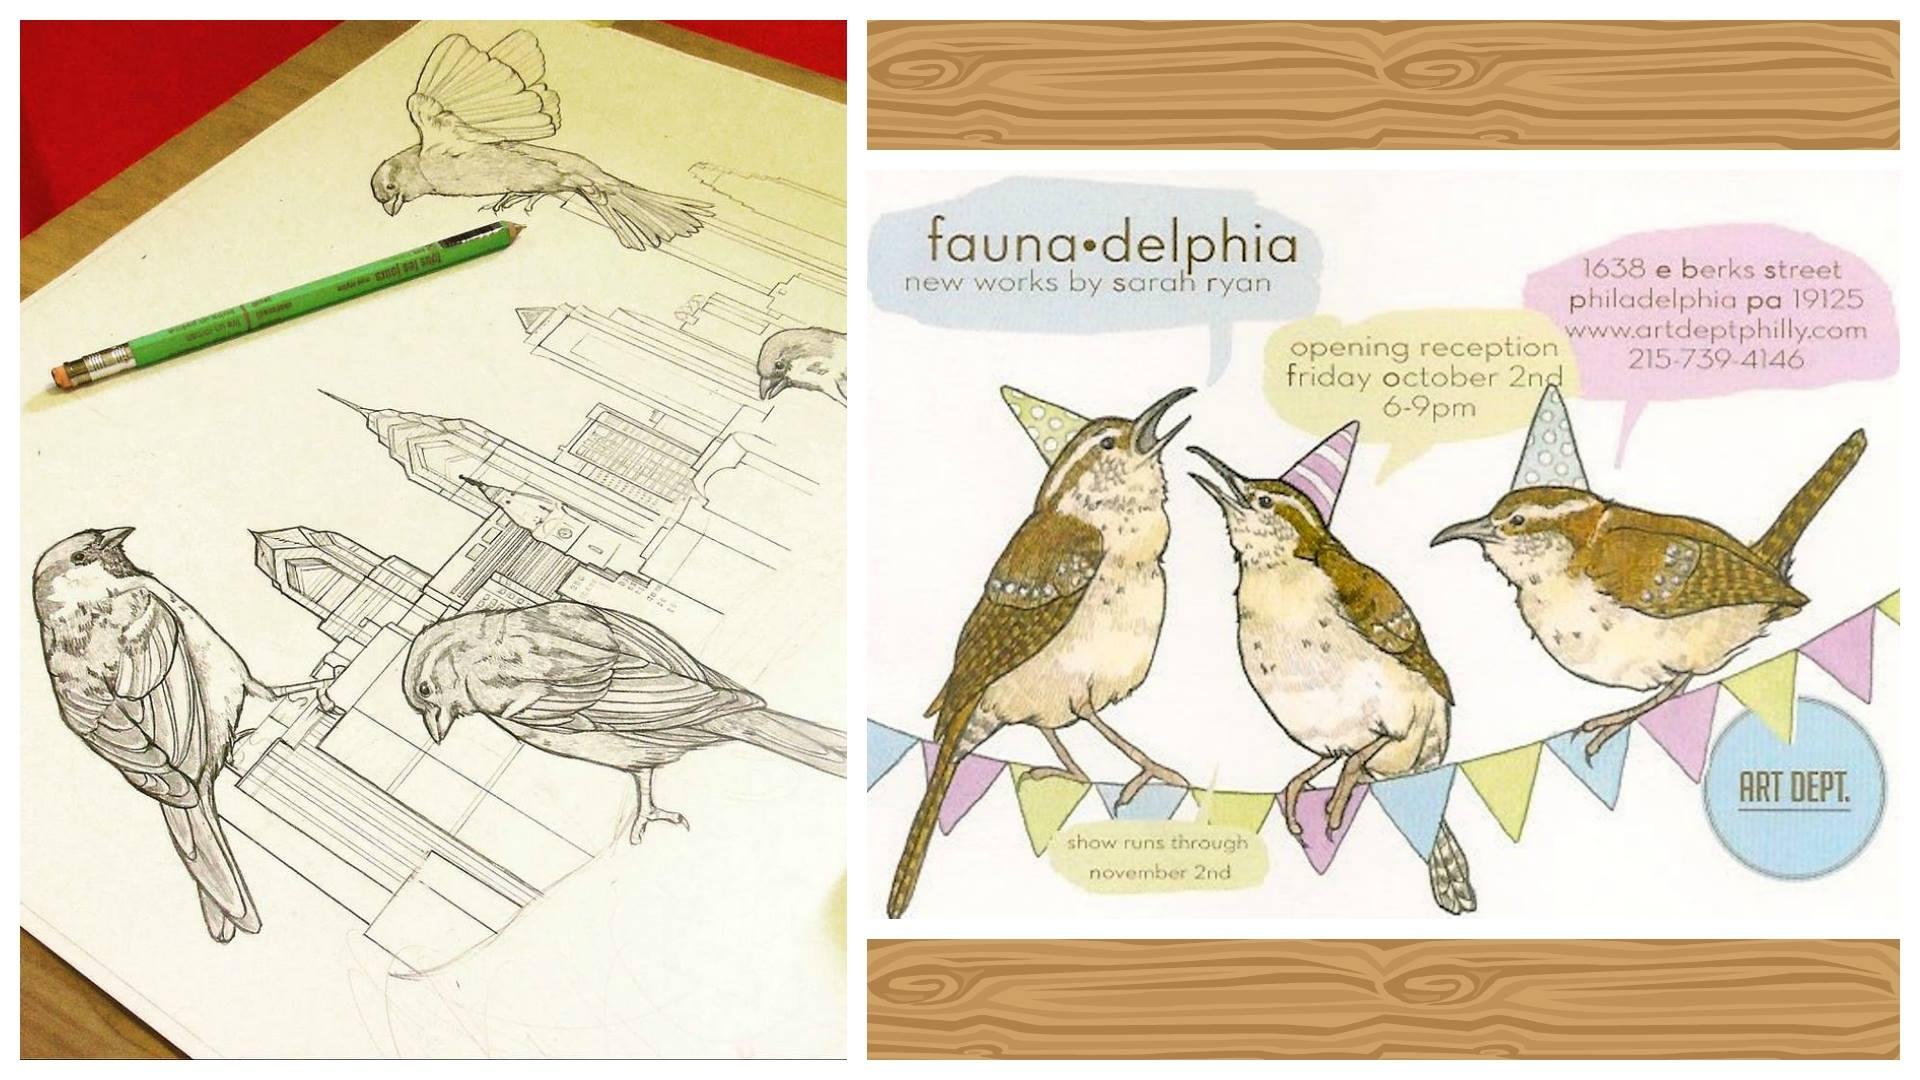 Sarah Ryan: Faunadelphia - featured exhibition at The Art Department in Philadelphia, PA.